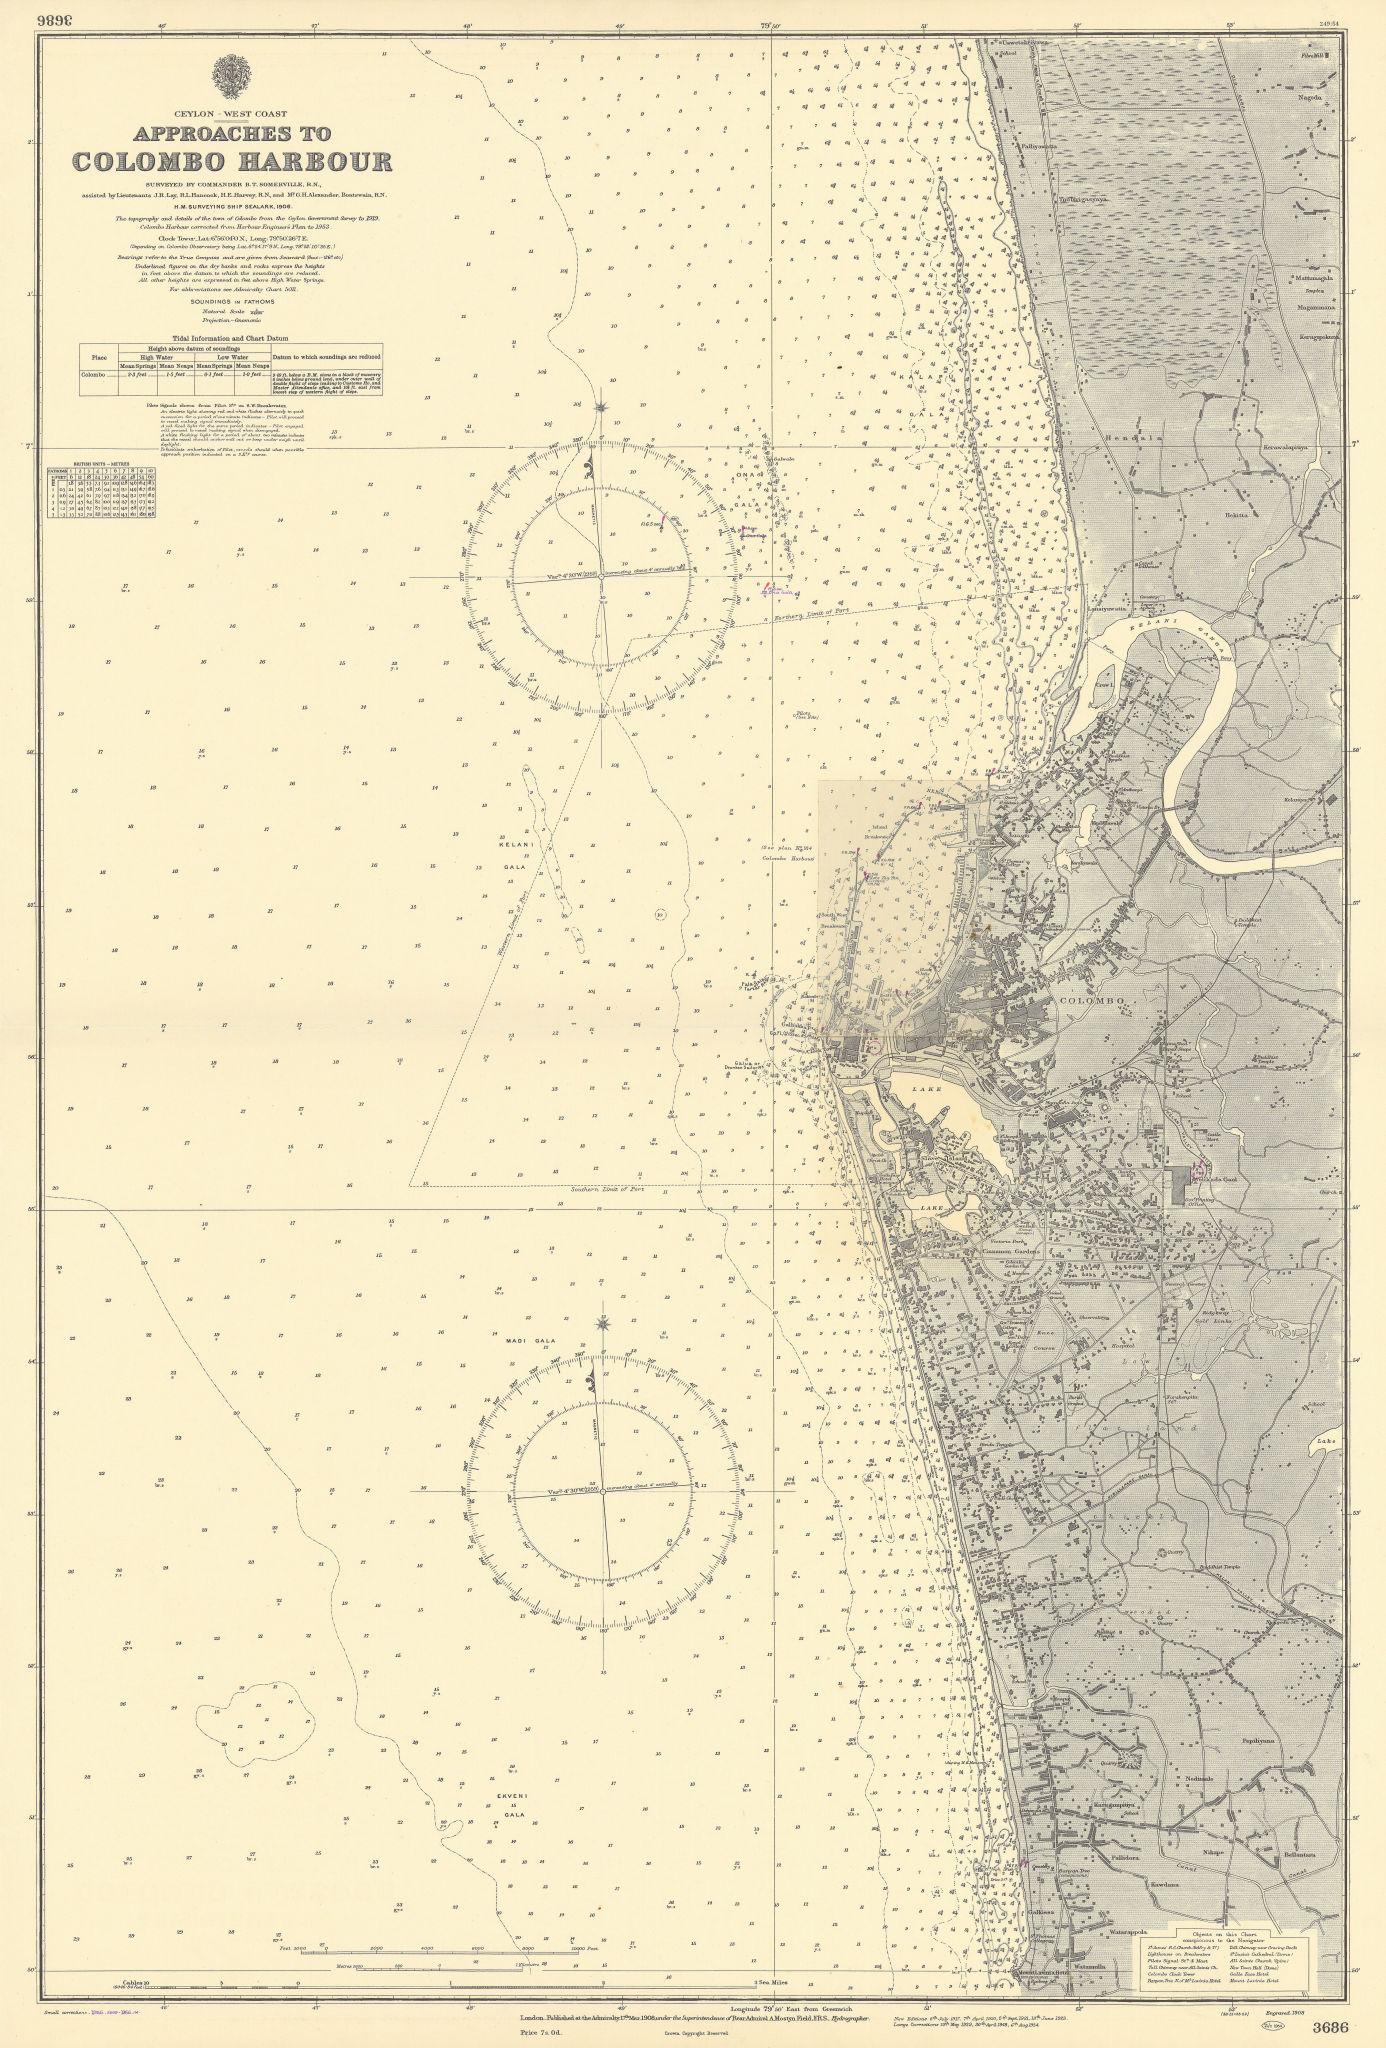 Colombo Harbour approaches Ceylon Sri Lanka. ADMIRALTY sea chart 1908 (1956) map